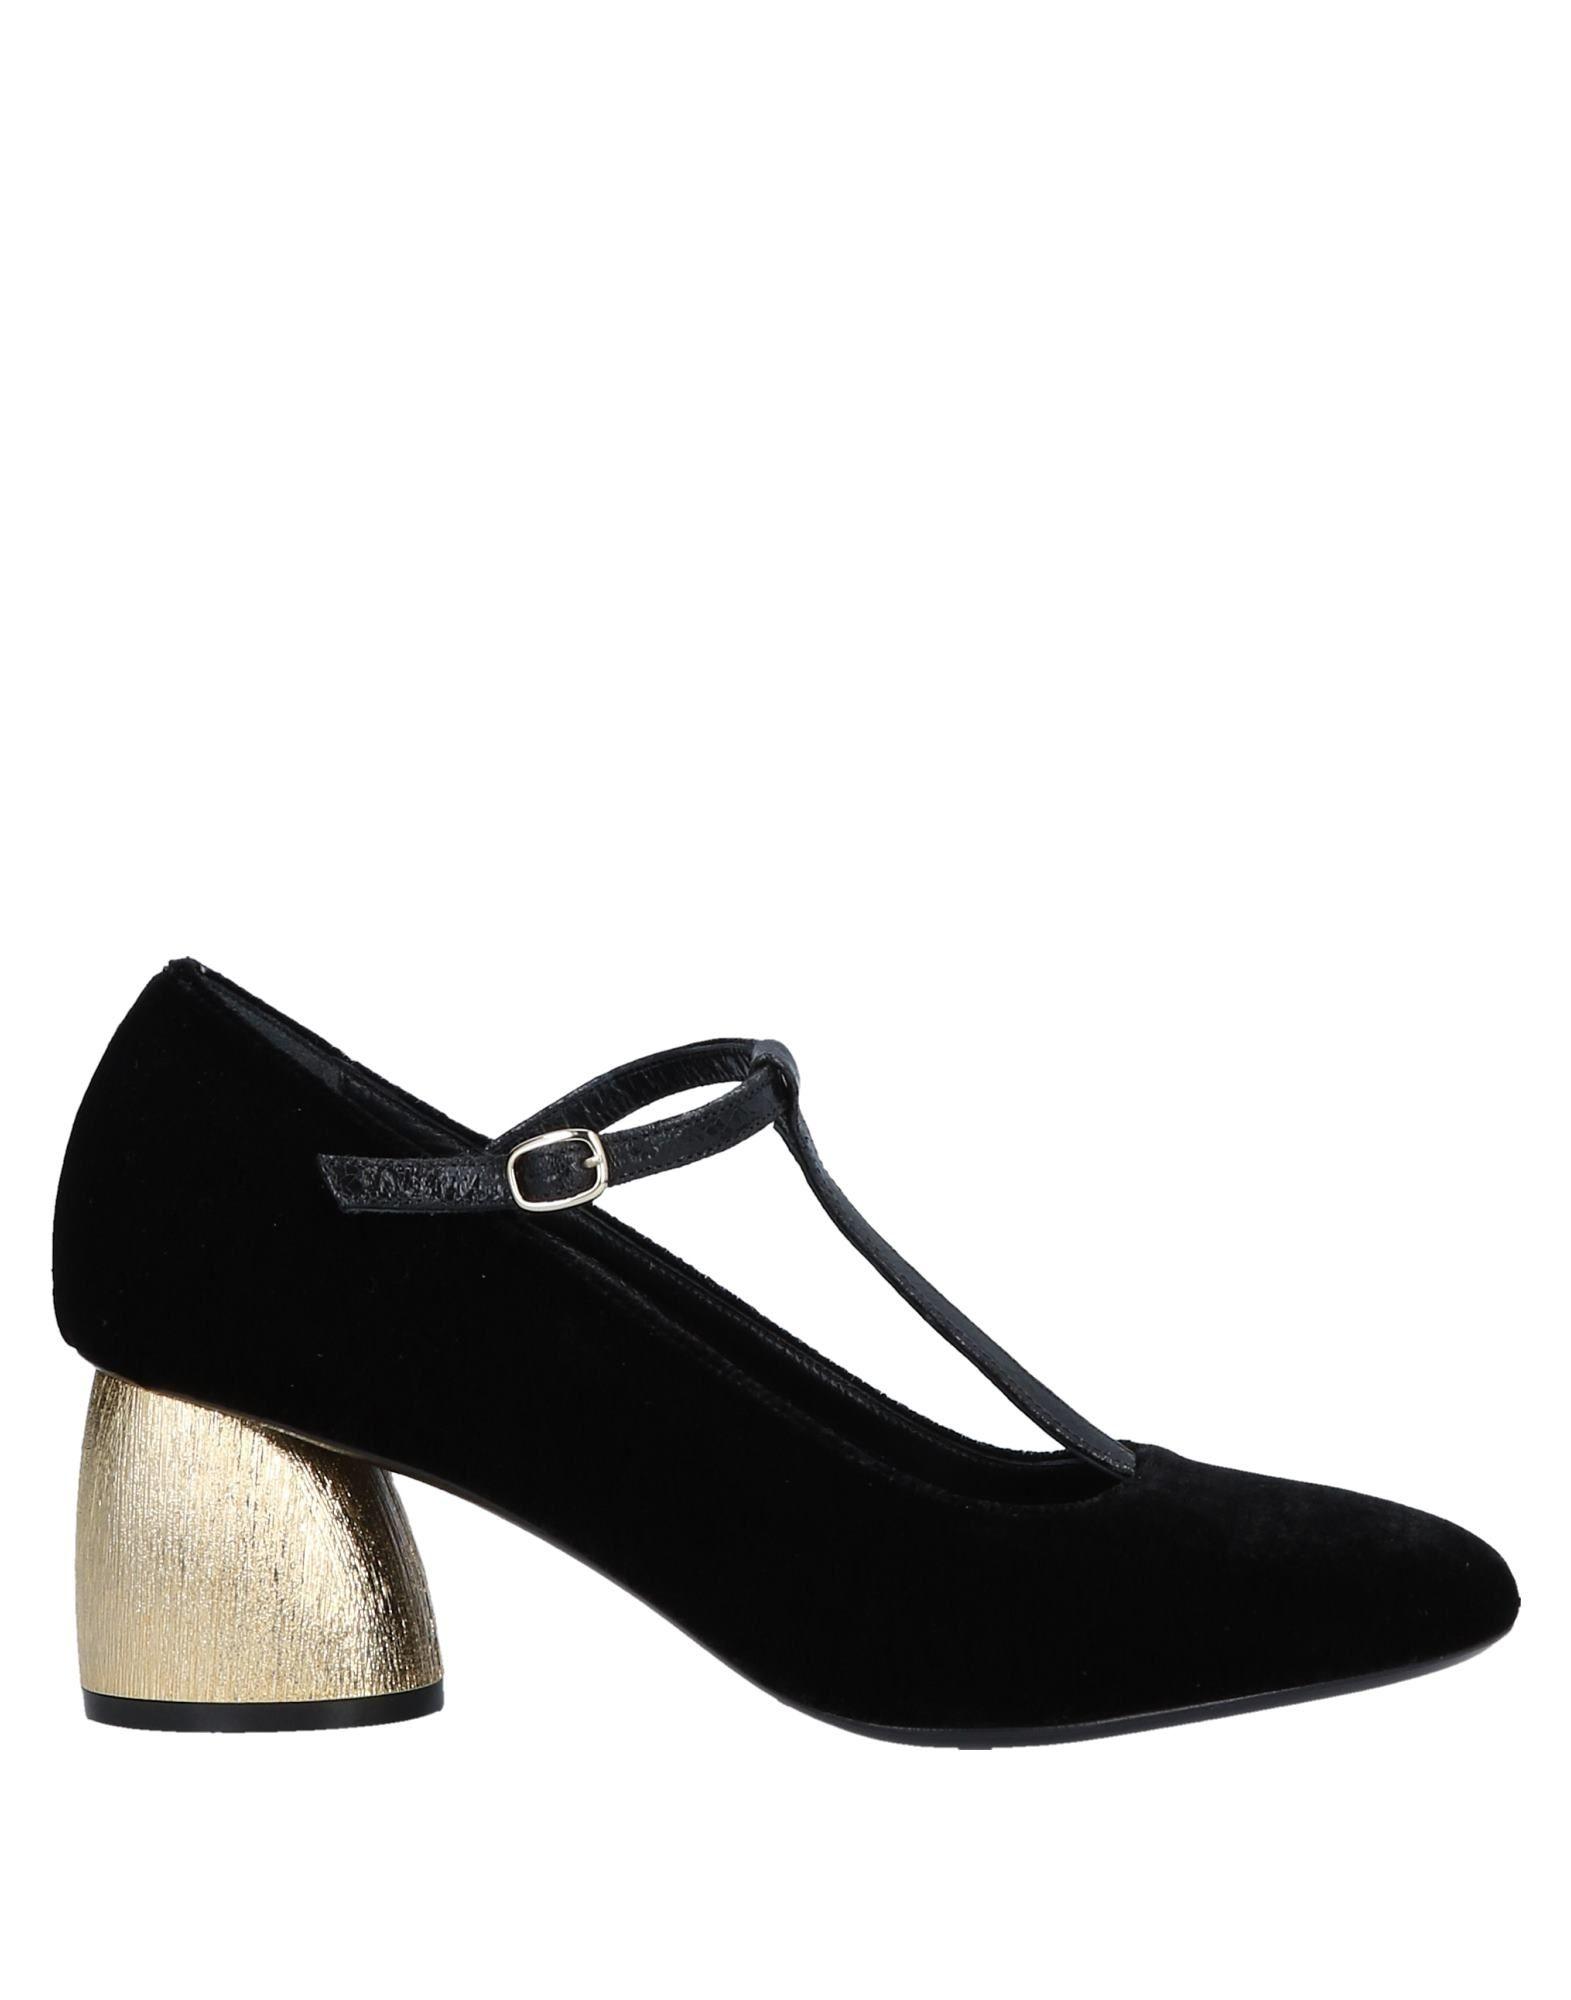 Фото - STRATEGIA Туфли bonpoint кожаные туфли